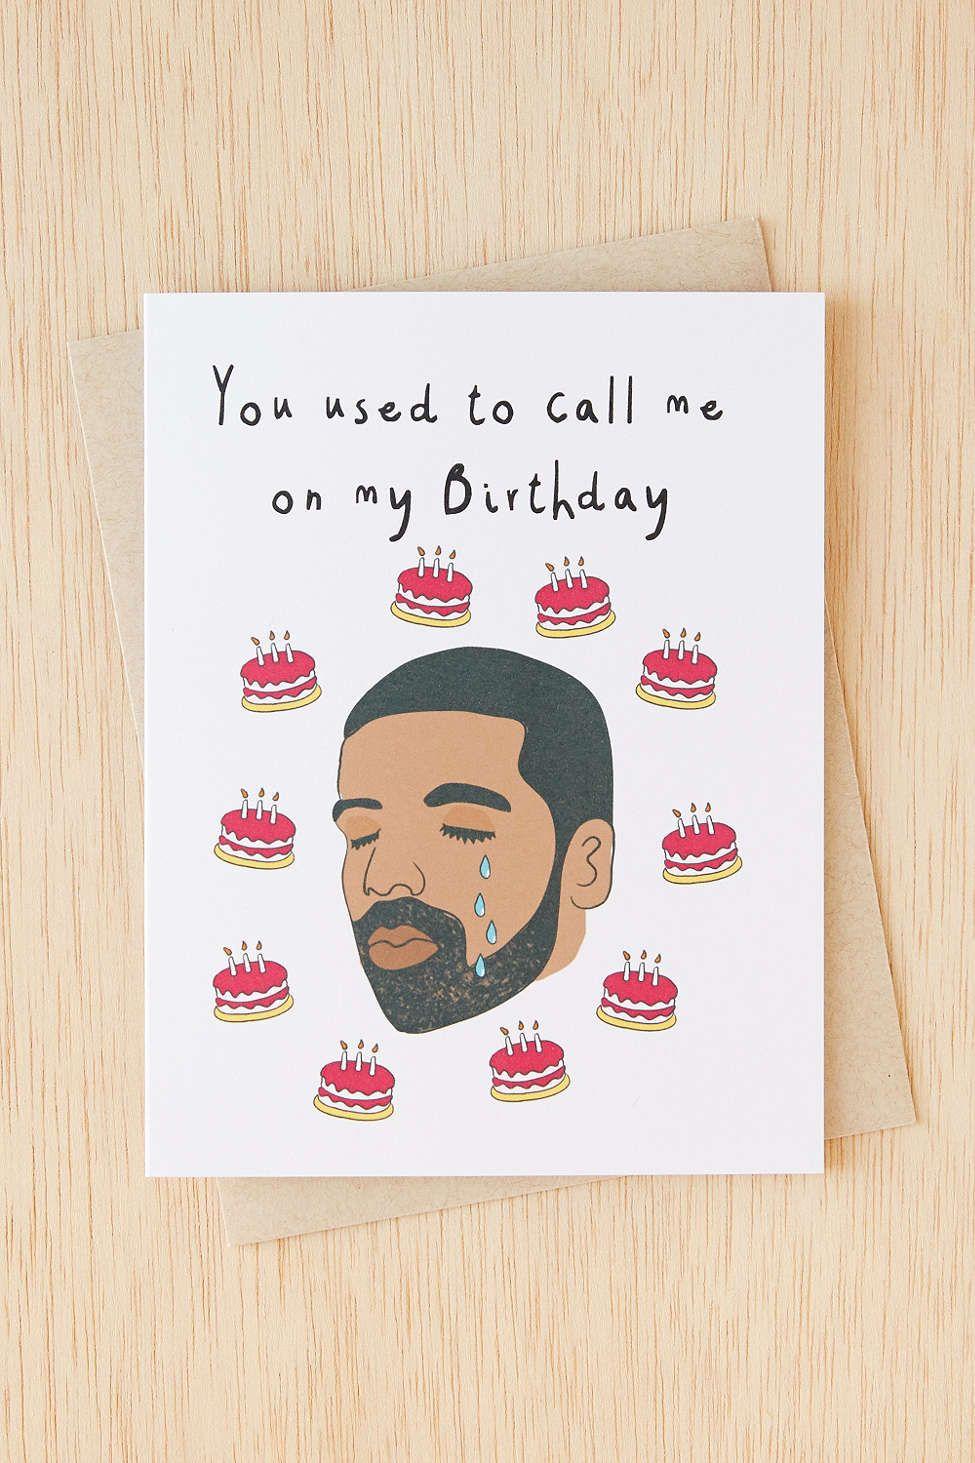 Diamond Donatello Drake Used To Call Birthday Card – Urban Birthday Cards